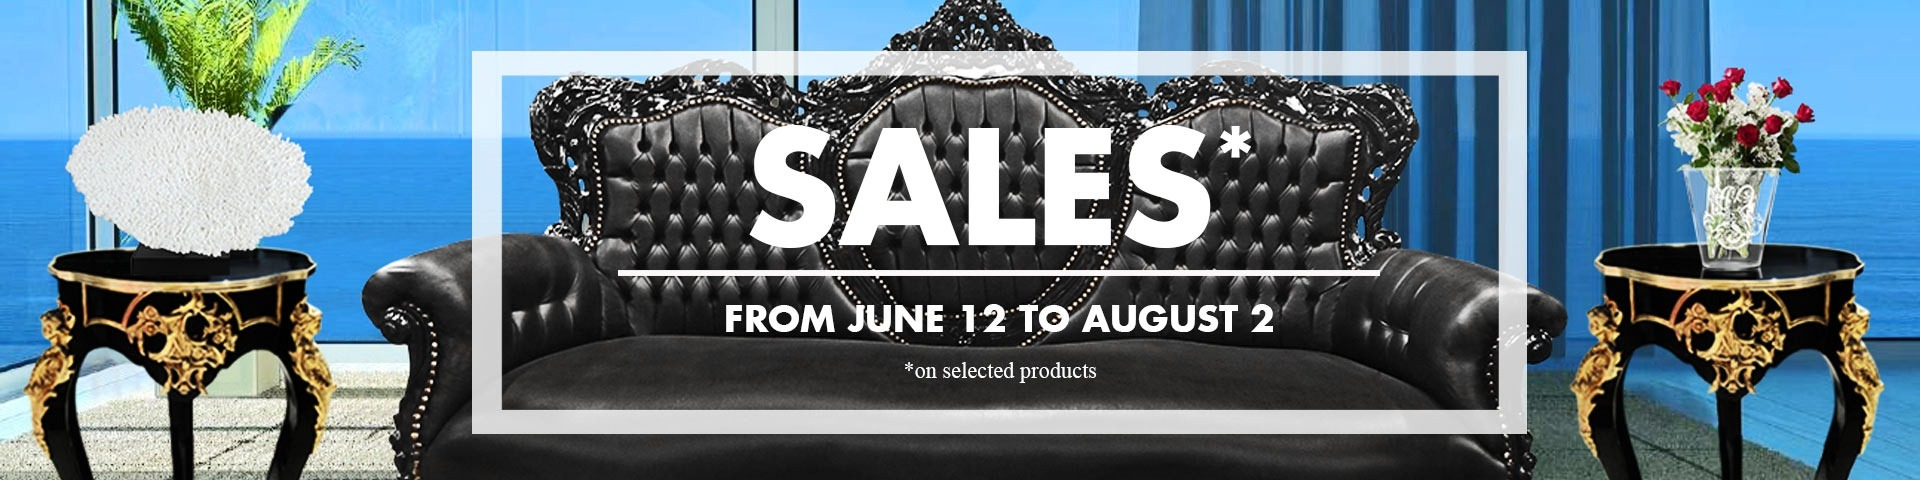 Sales summer 2016